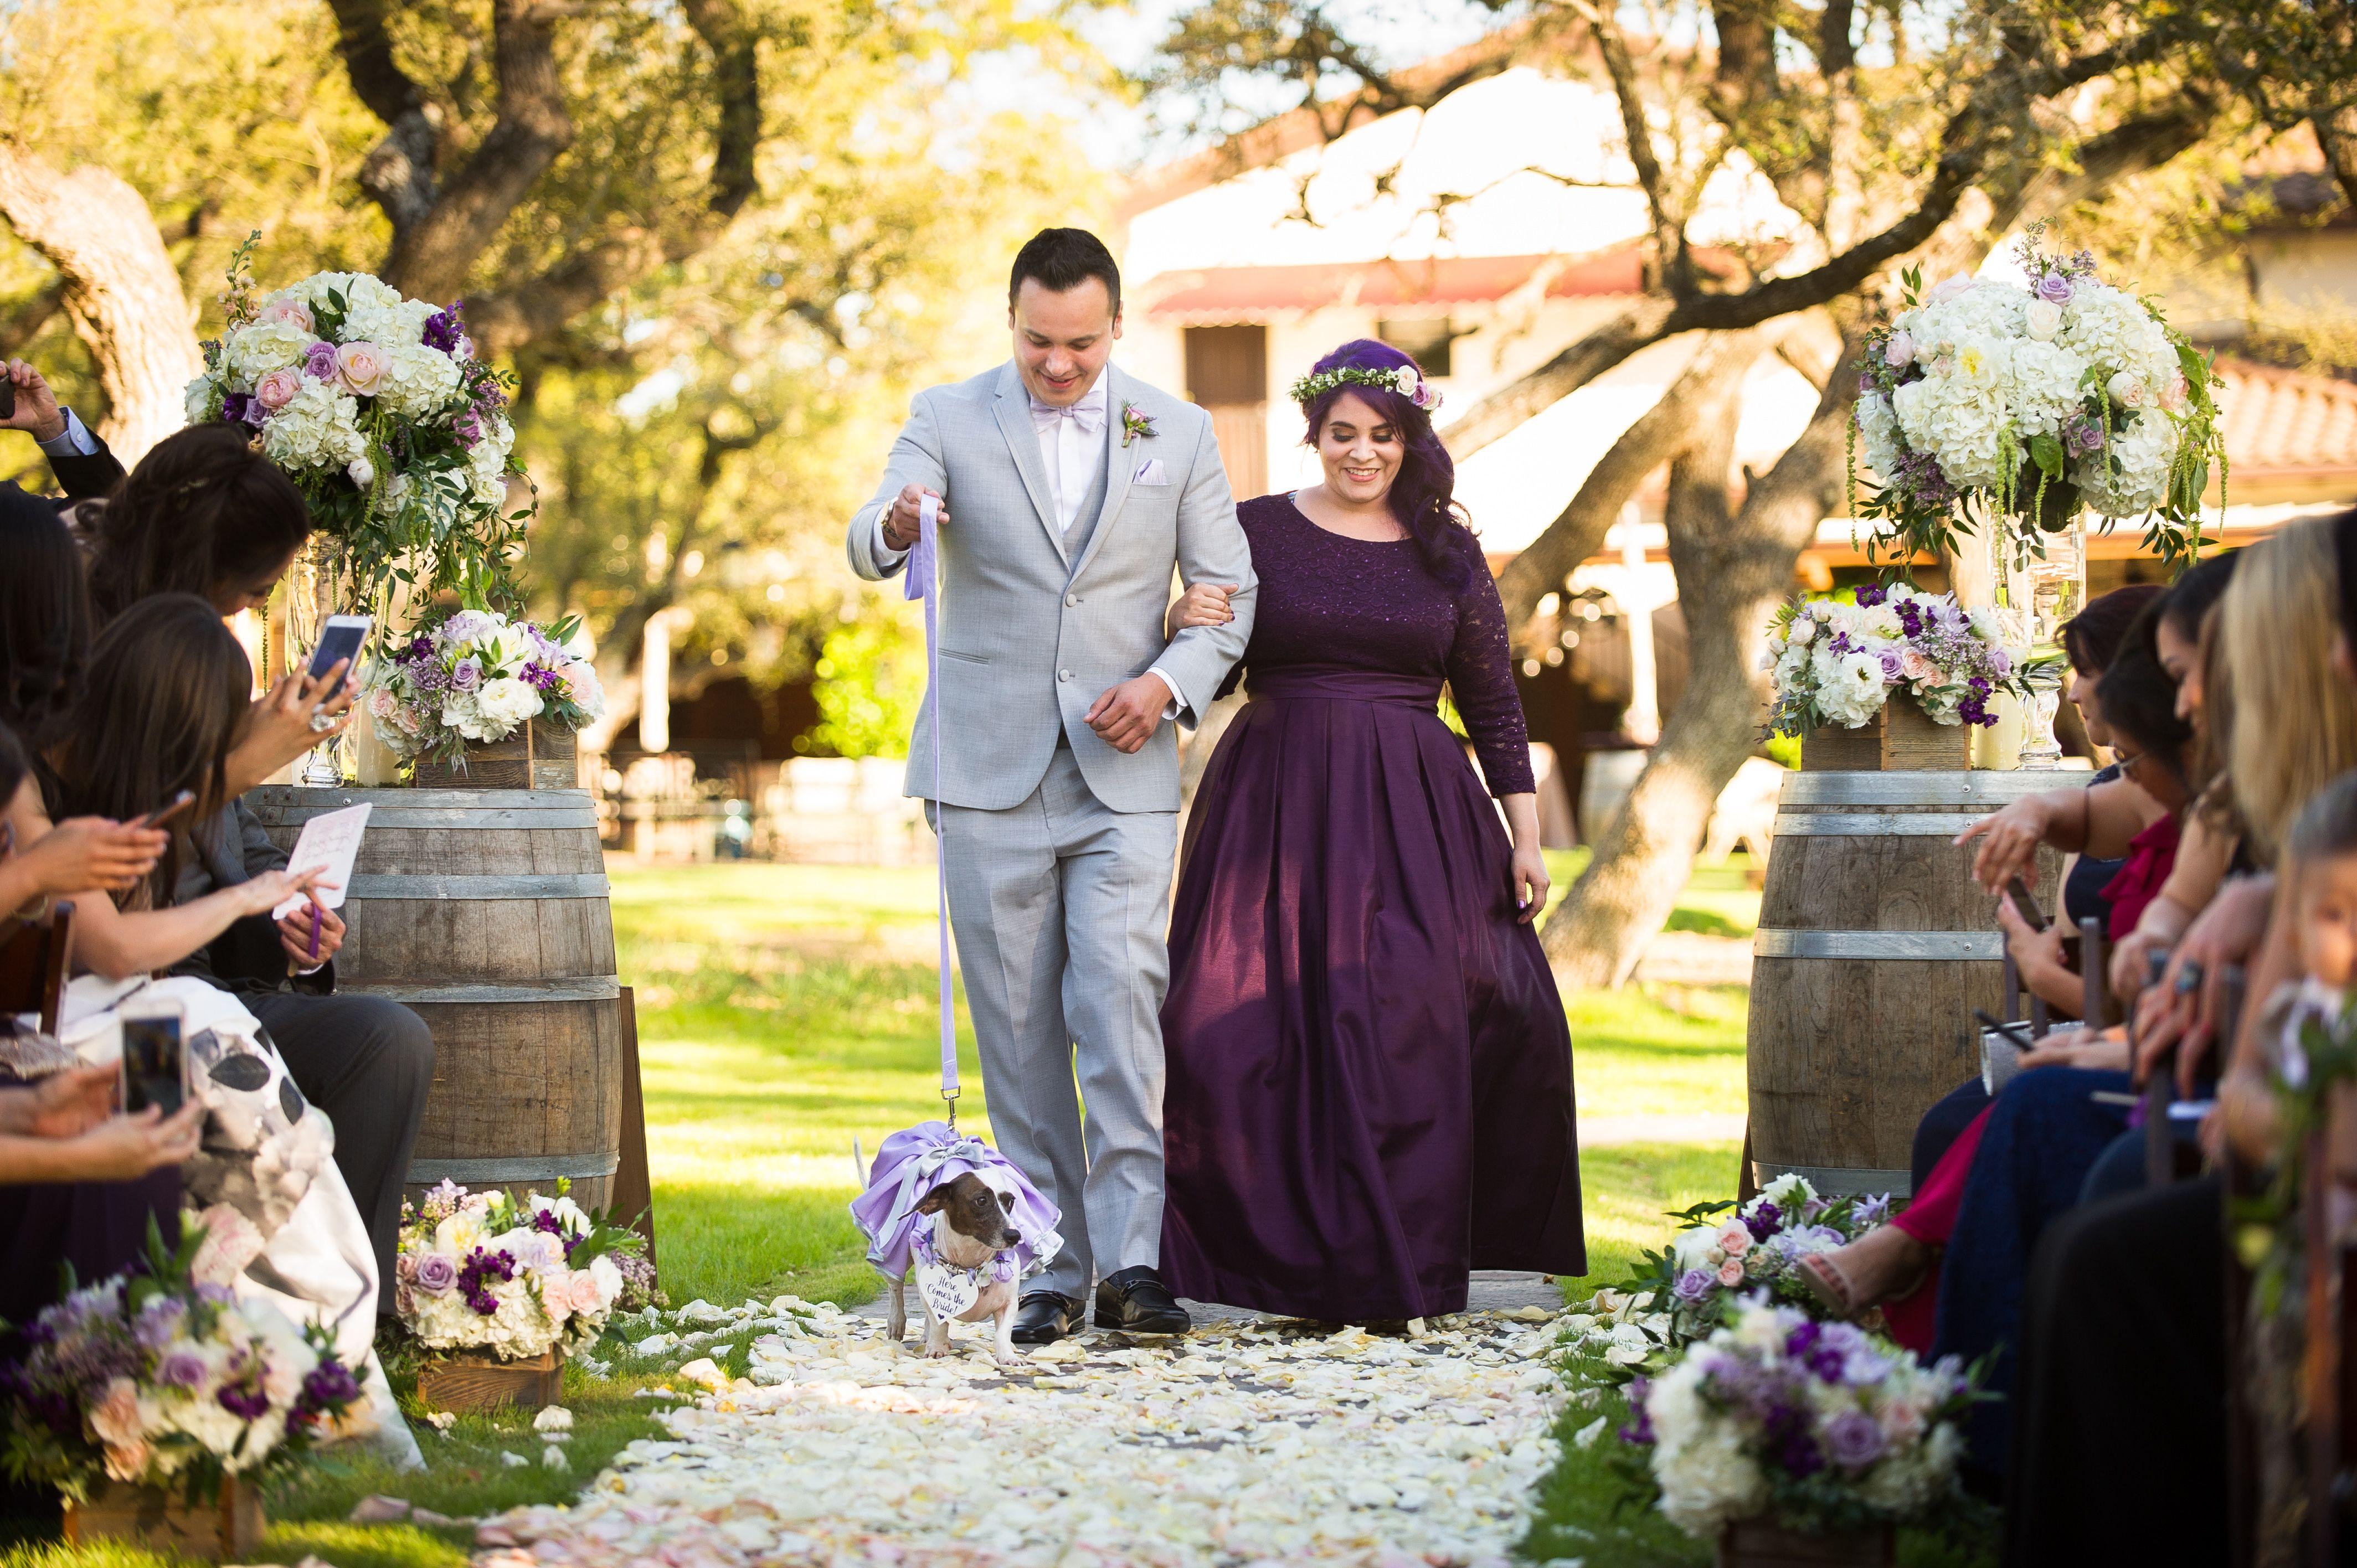 Texas Hill Country Wedding Venue Wedding venues, Wedding